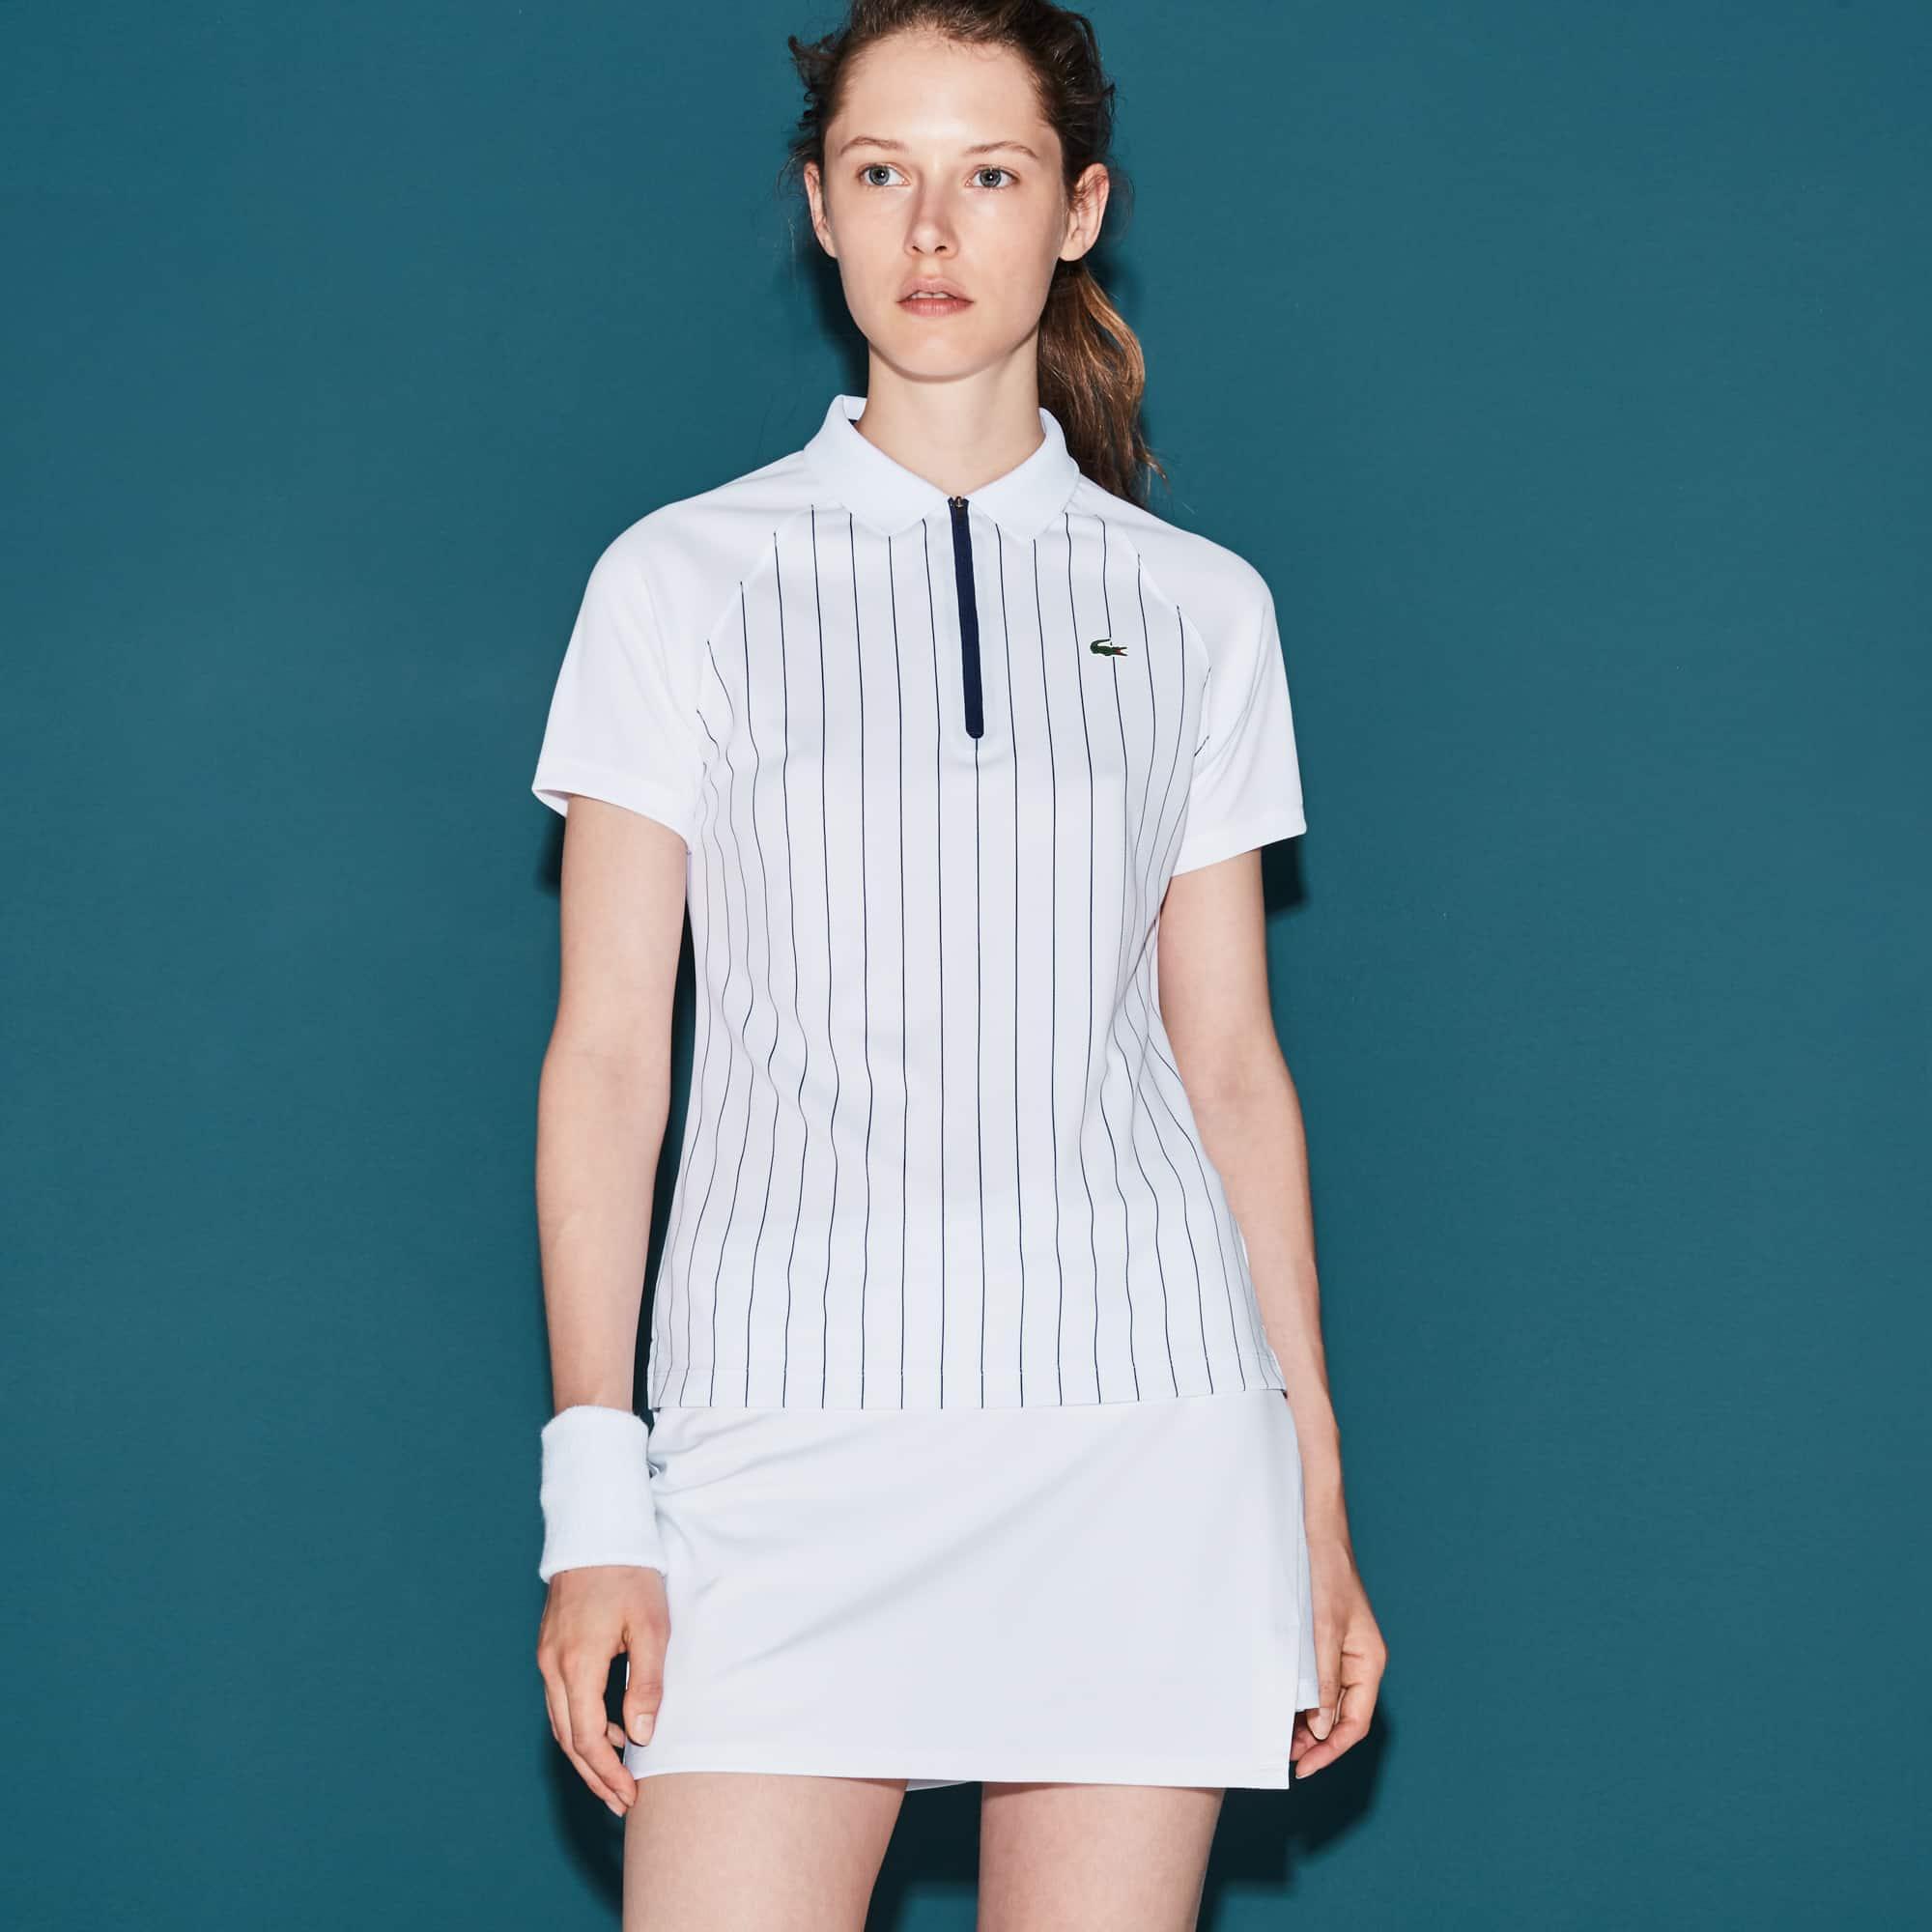 Women's Lacoste SPORT Tennis Zip Neck Striped Tech Piqué Polo